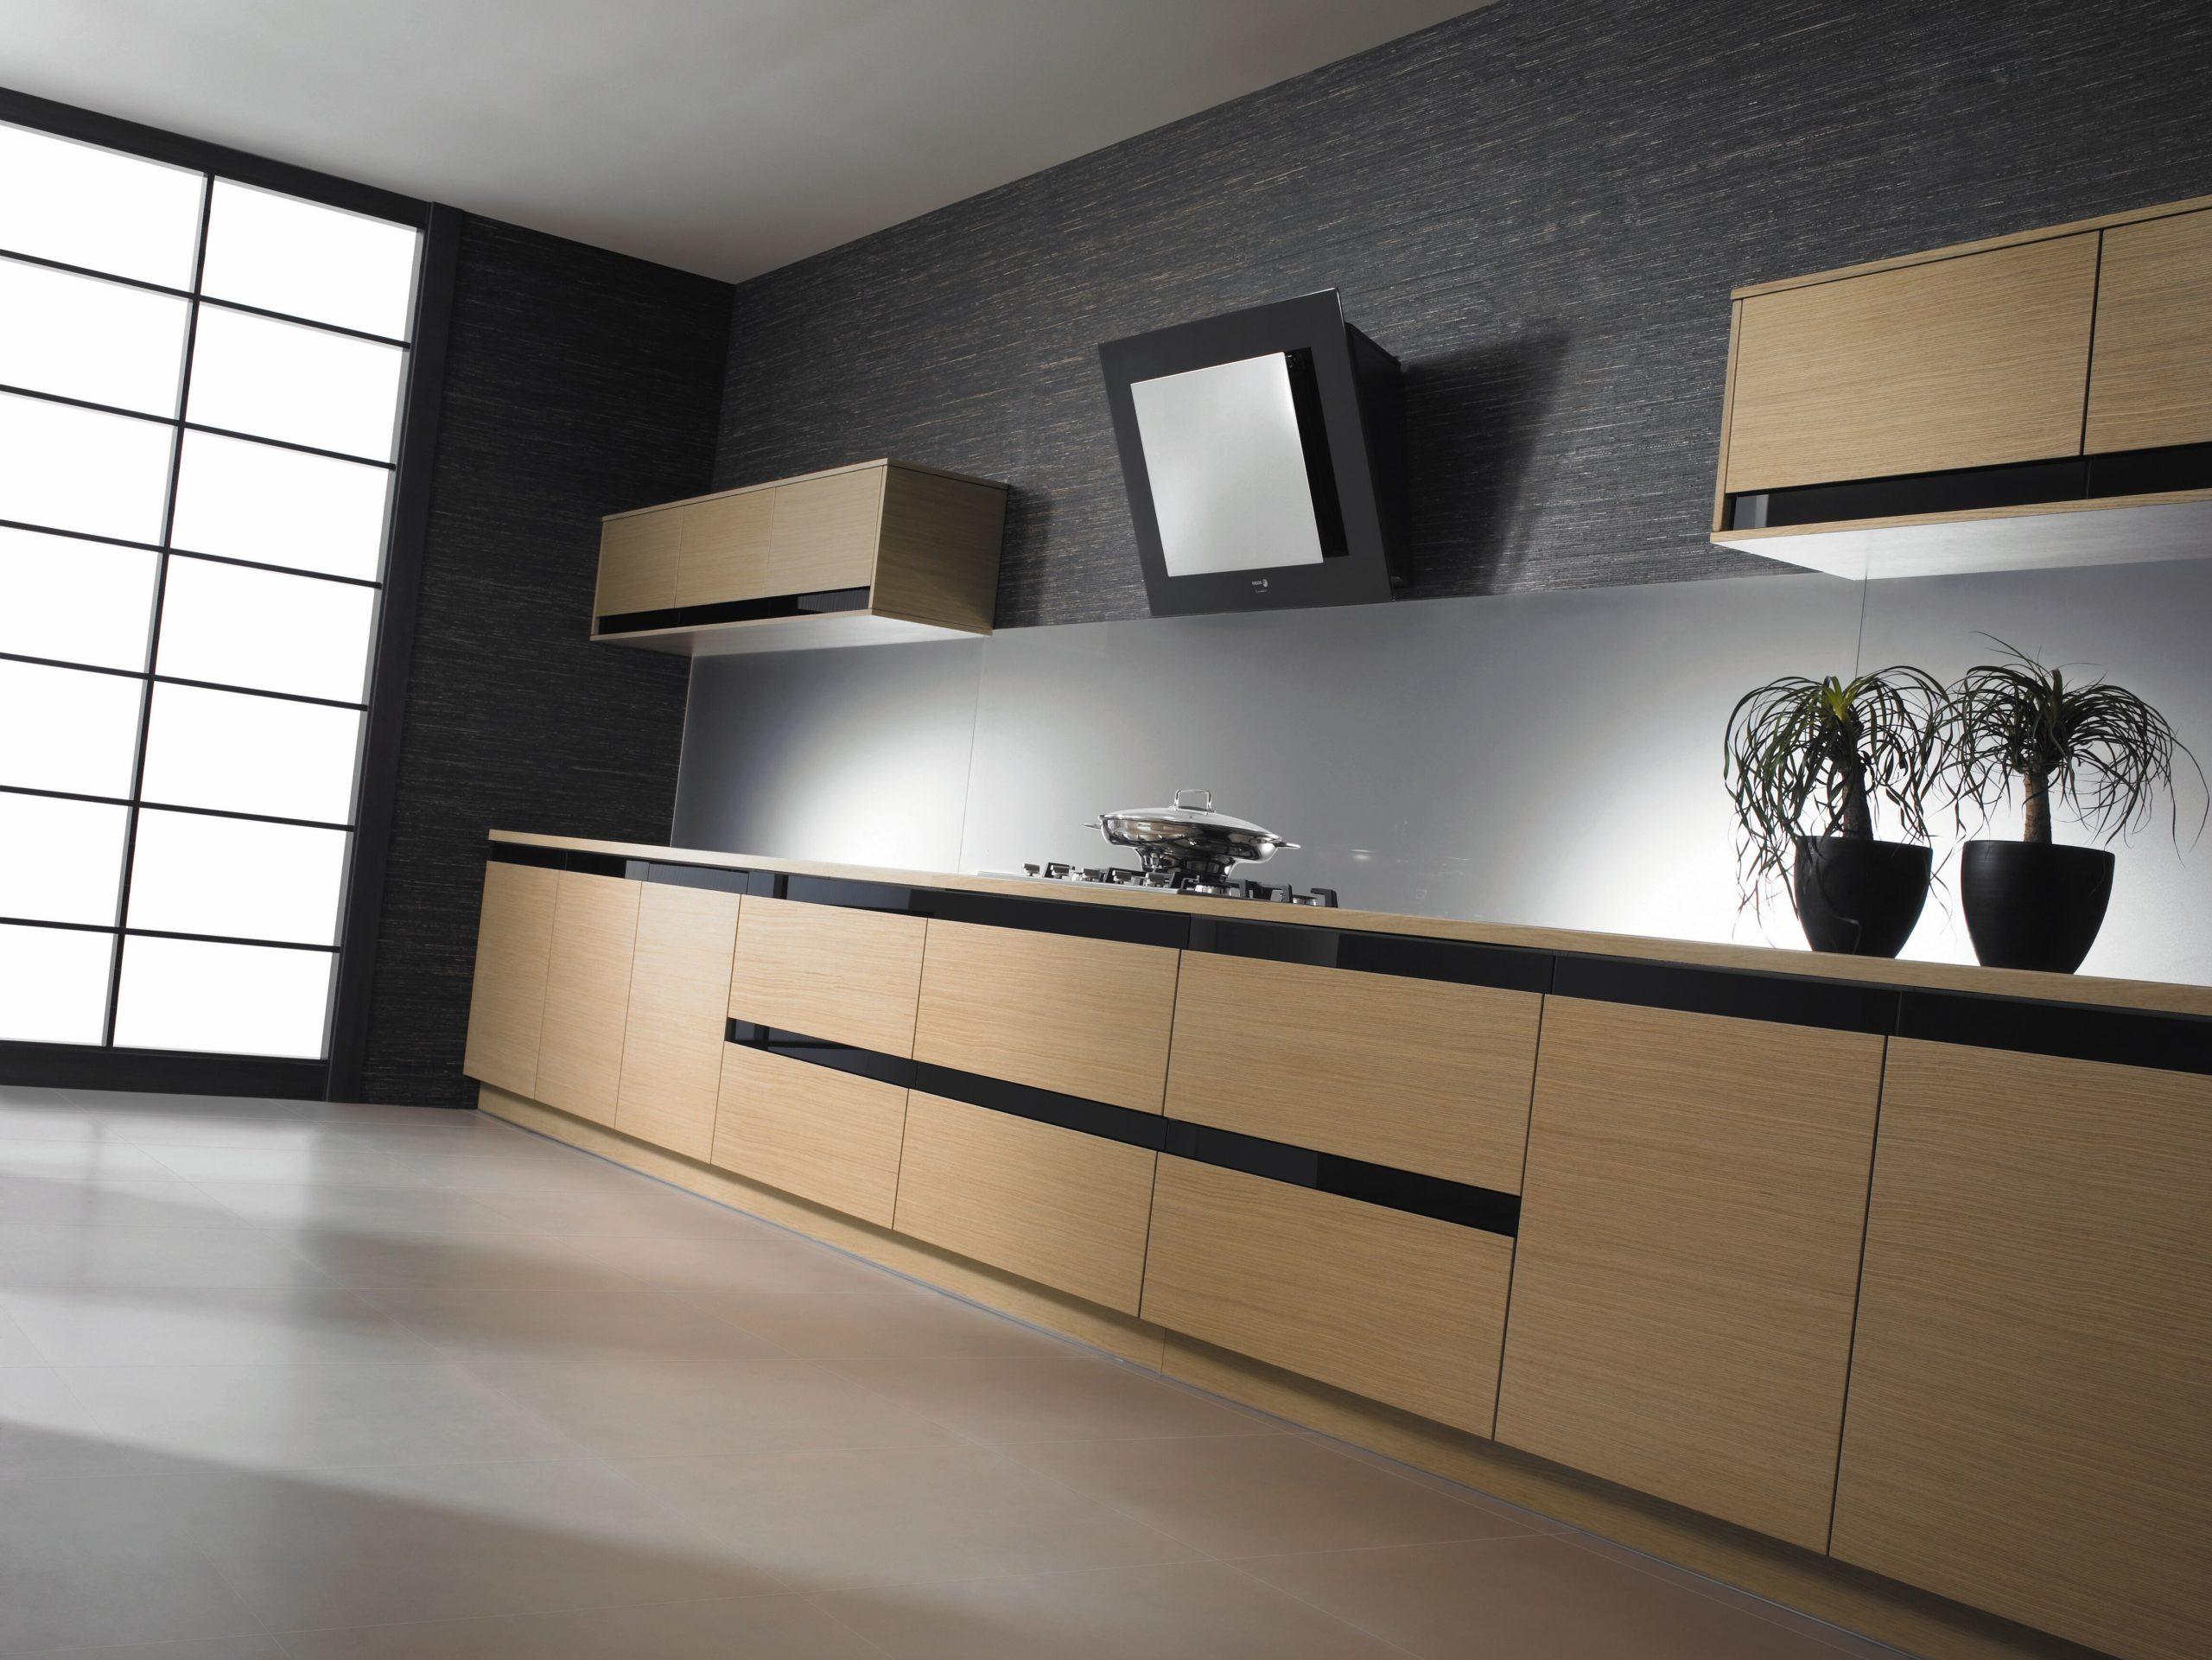 Cocinas de madera de roble cocinas de madera with cocinas - Cocinas de madera de roble ...